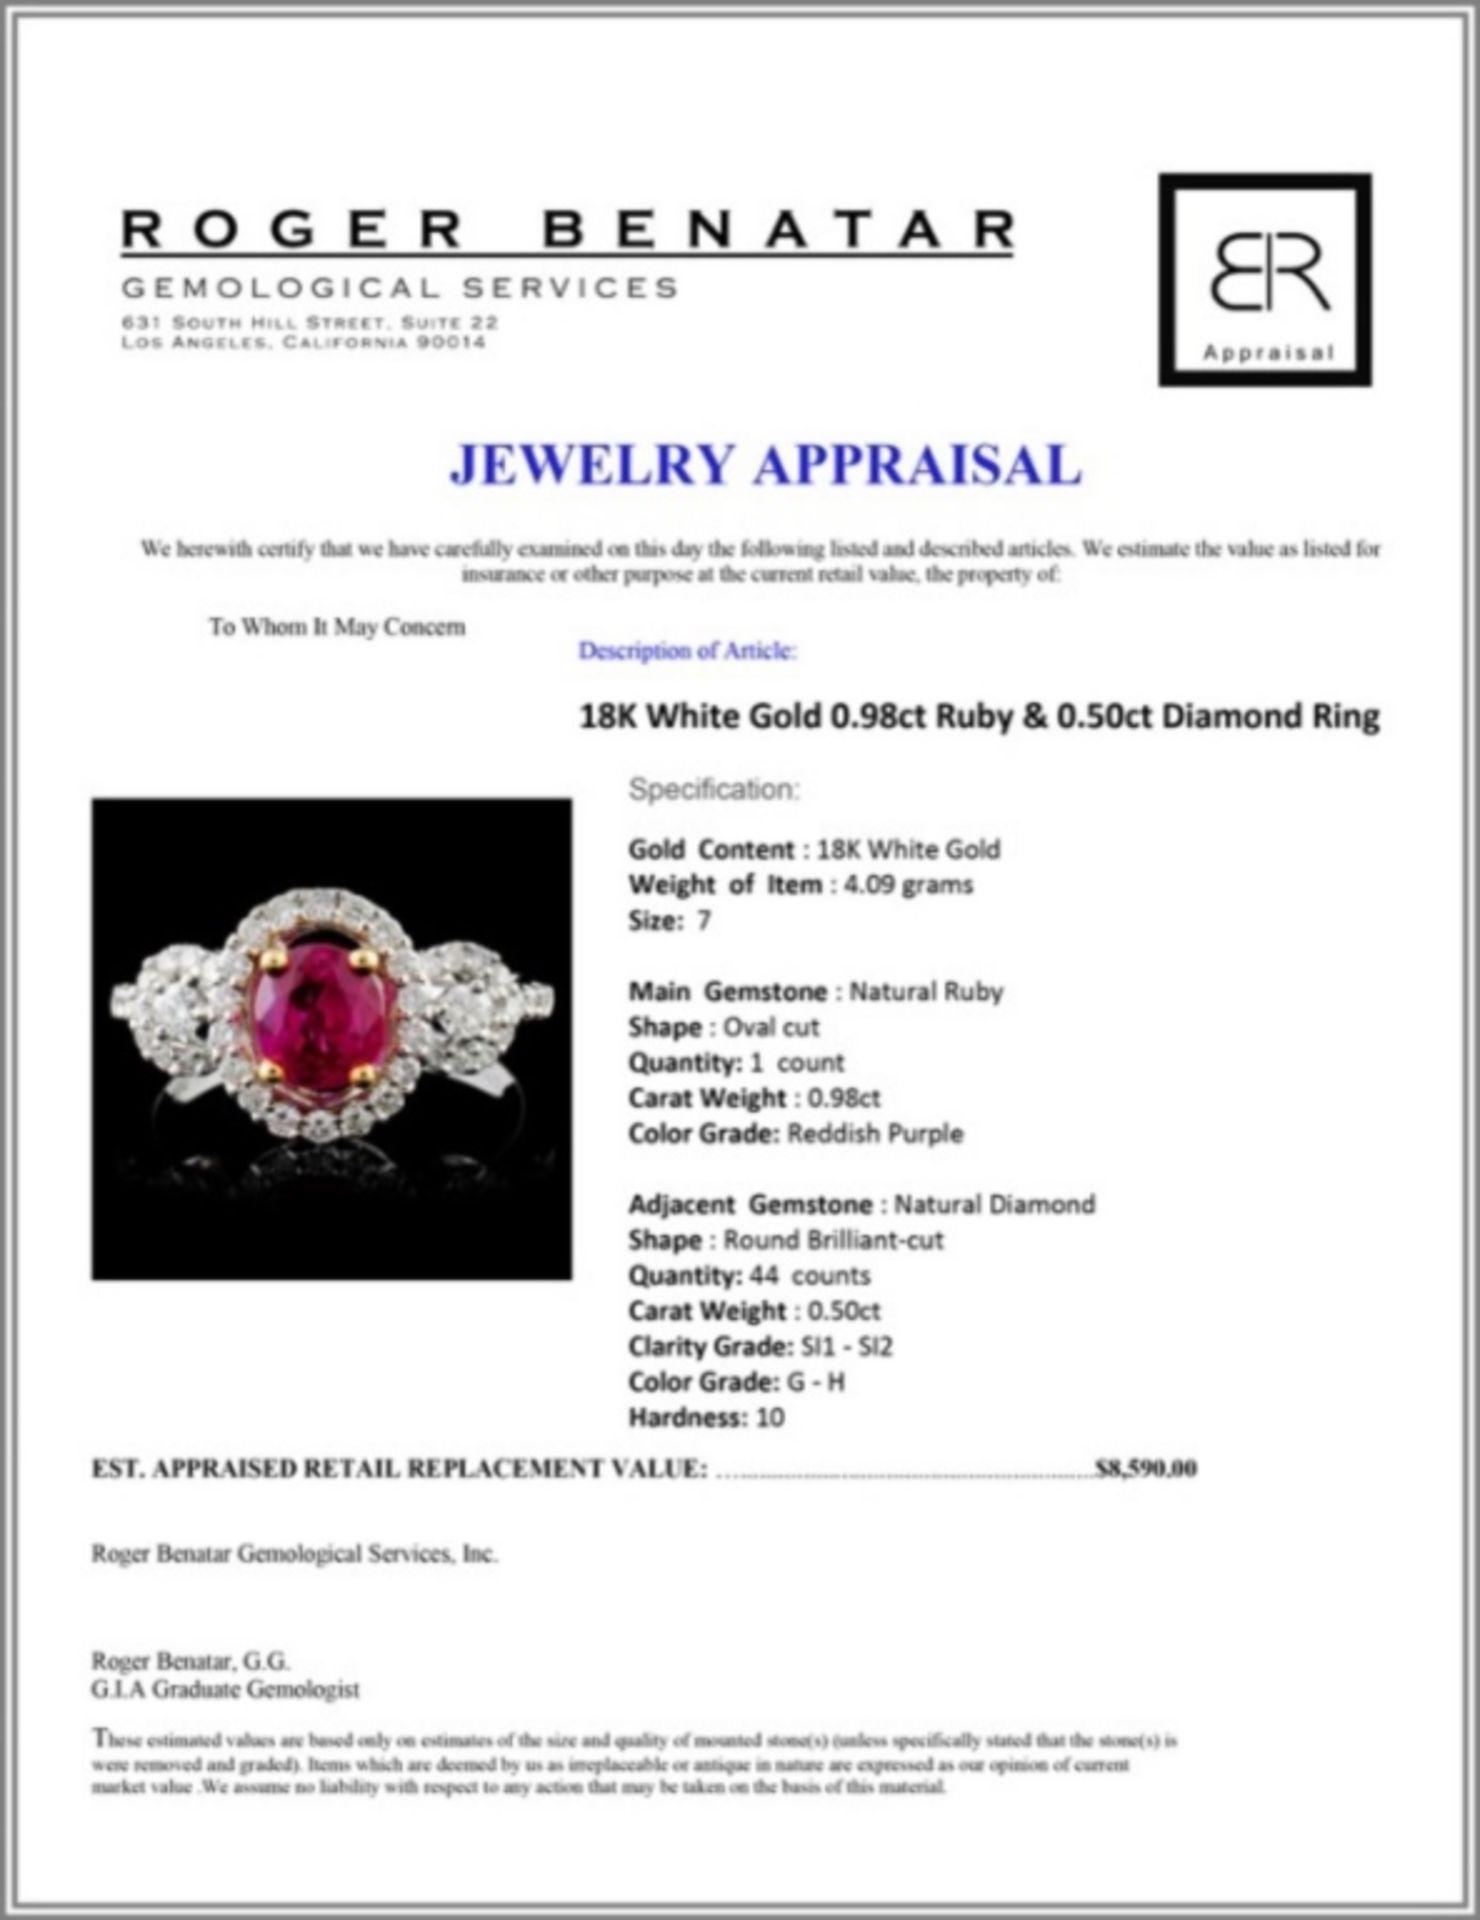 18K White Gold 0.98ct Ruby & 0.50ct Diamond Ring - Image 4 of 4